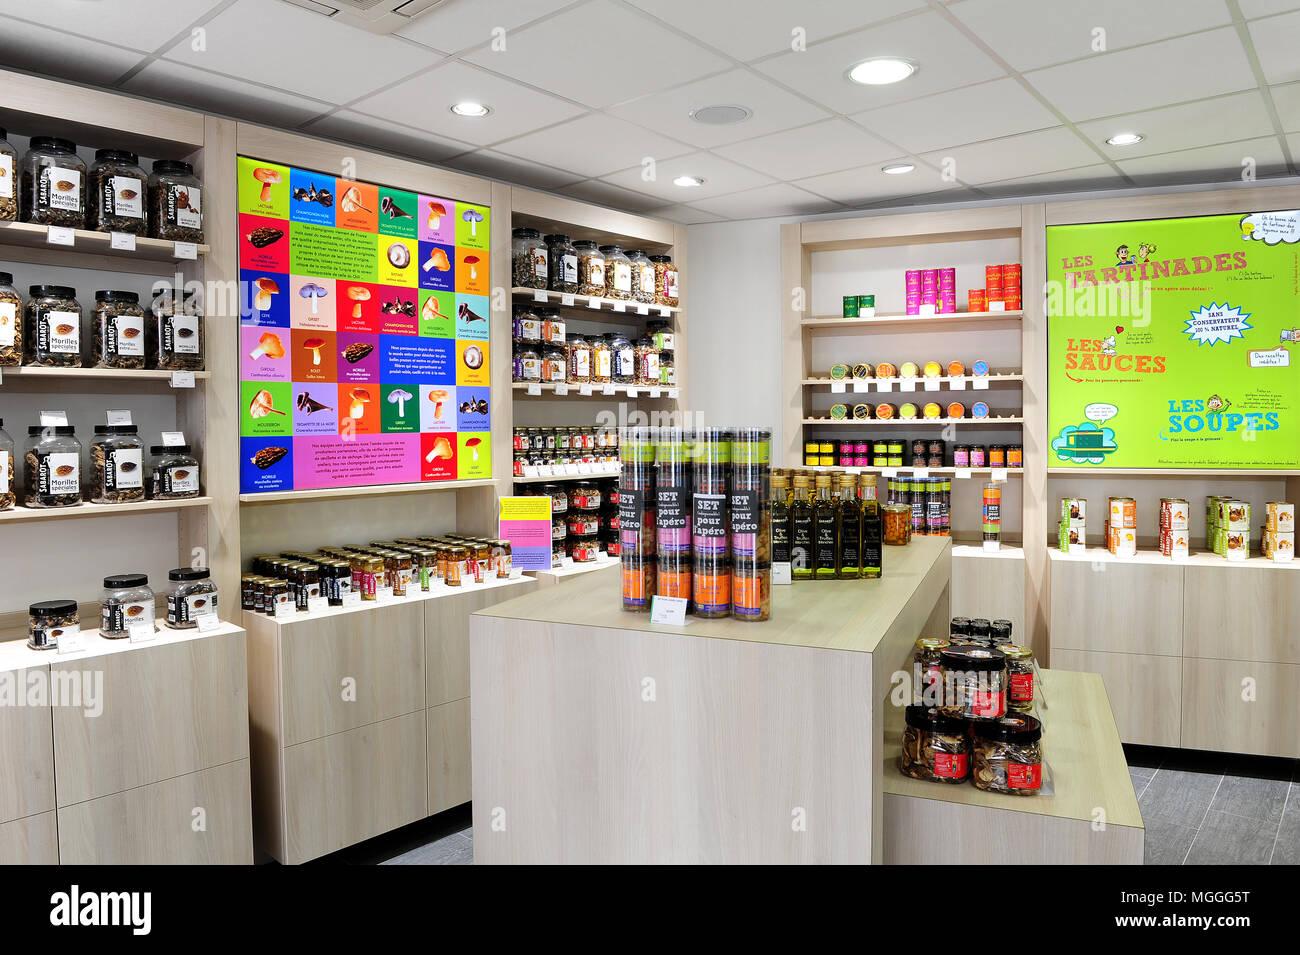 Sabarot gourmet food shop in Le-Puy-en-Velais, France - Stock Image